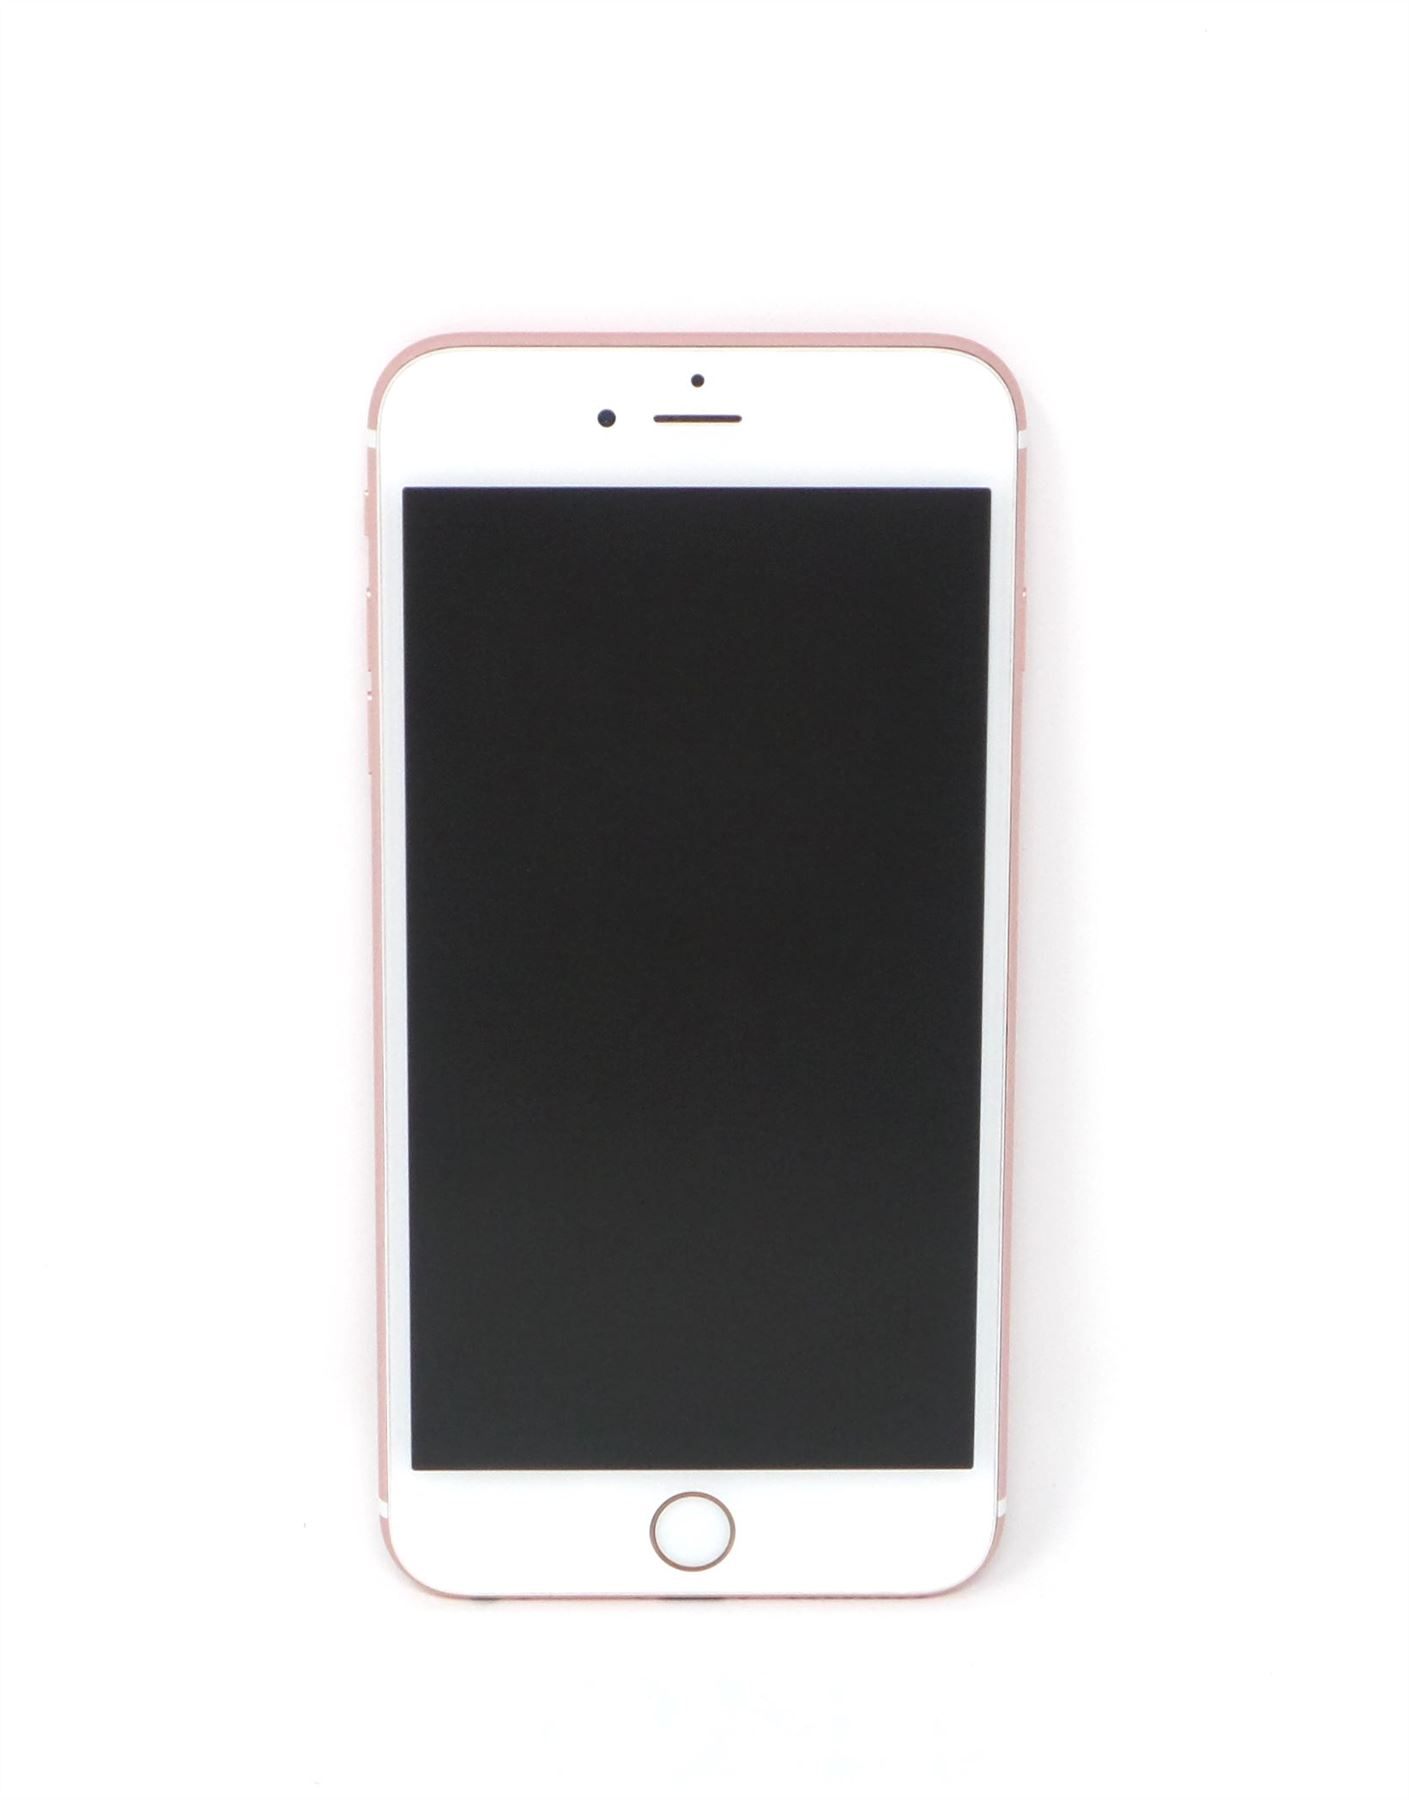 Apple-iPhone-6S-Plus-Carrier-Options-AT-amp-T-T-Mobile-Verizon-Unlocked-16-64-128GB thumbnail 15